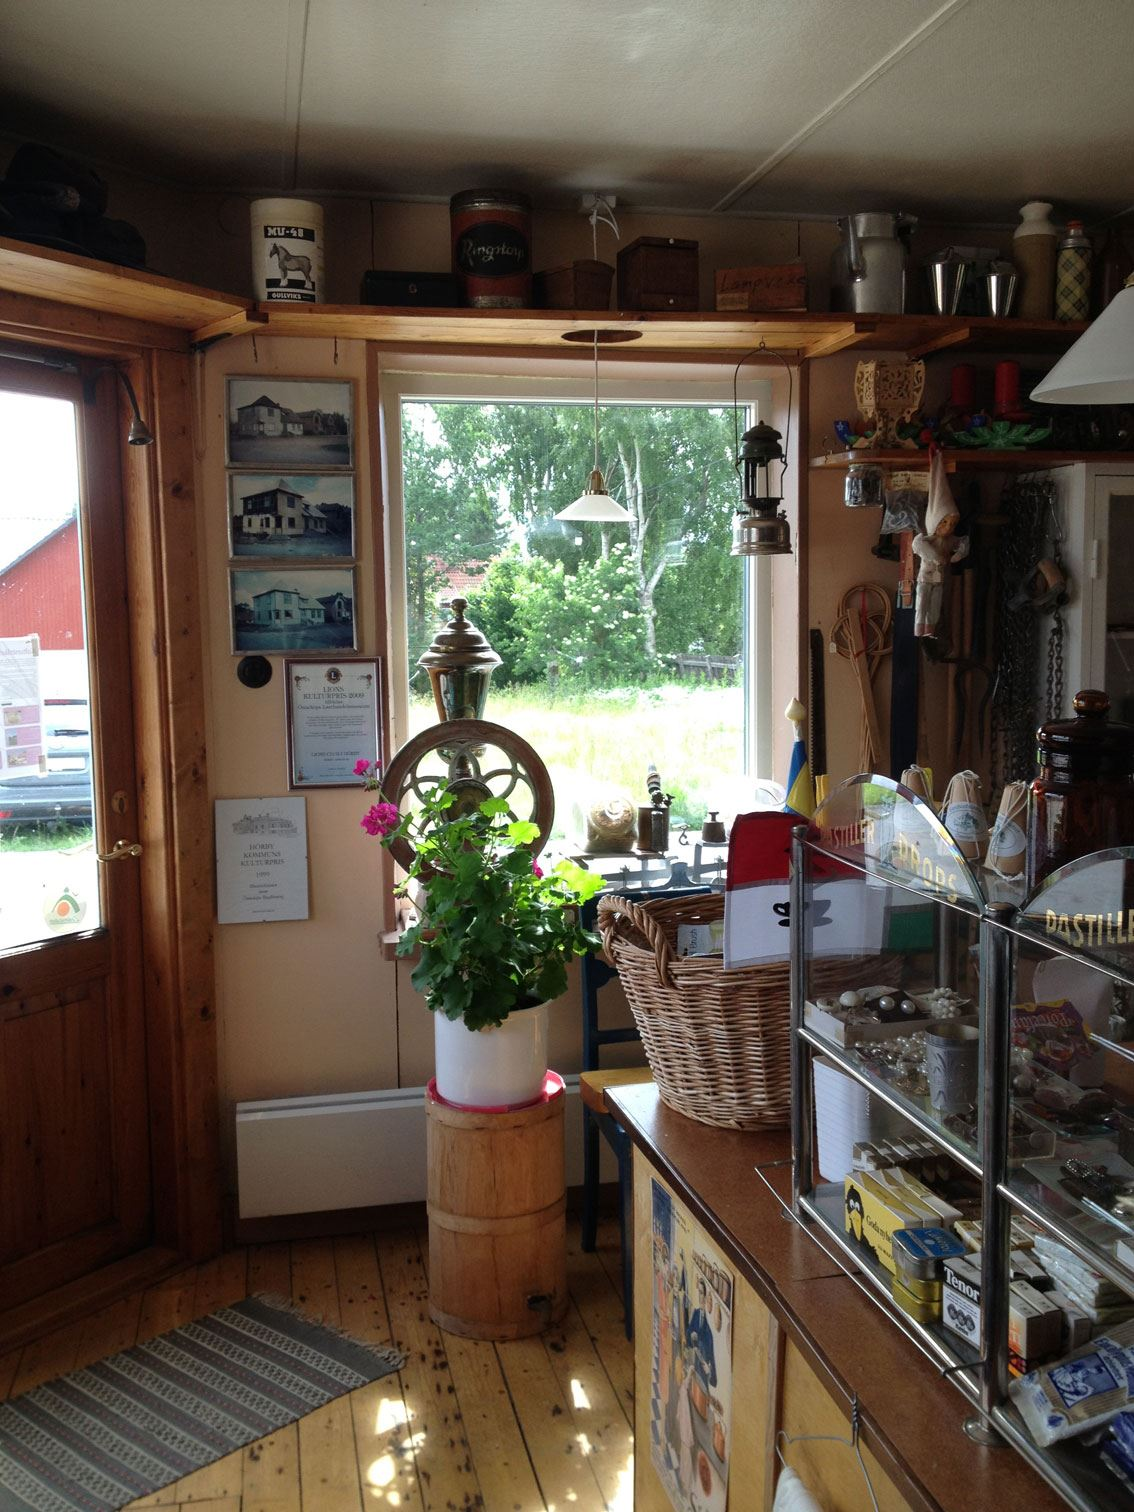 Cherie Palmzon,  © Linderödsåsens tursim, Lanthandelsmuséet in Önneköp